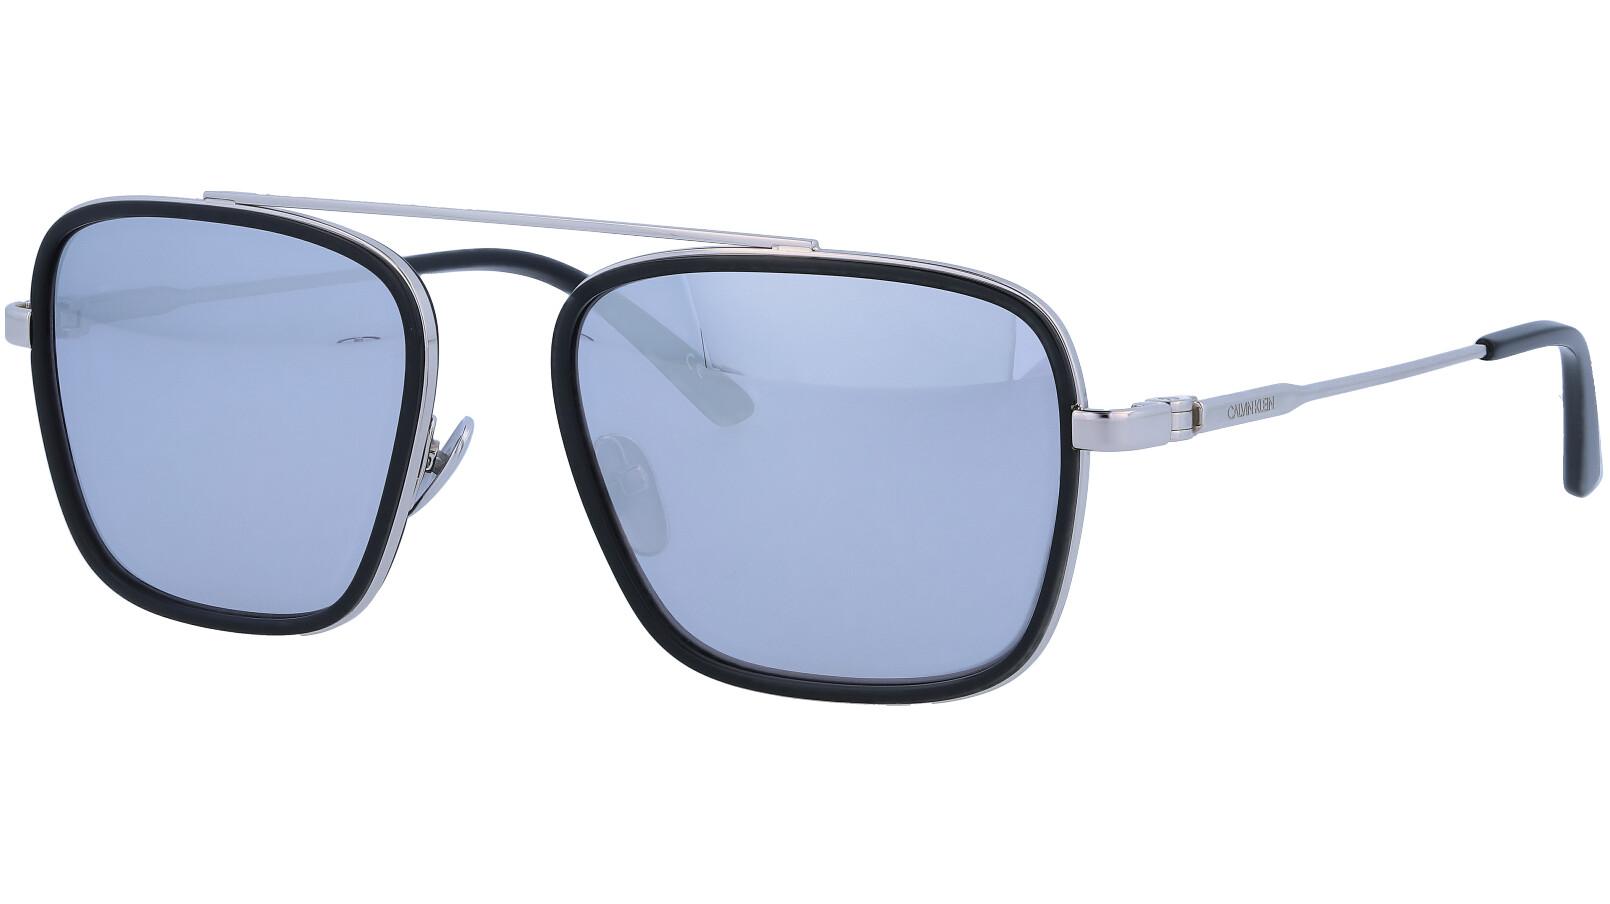 CALVIN KLEIN CK18102S 001 55 BLACK Sunglasses